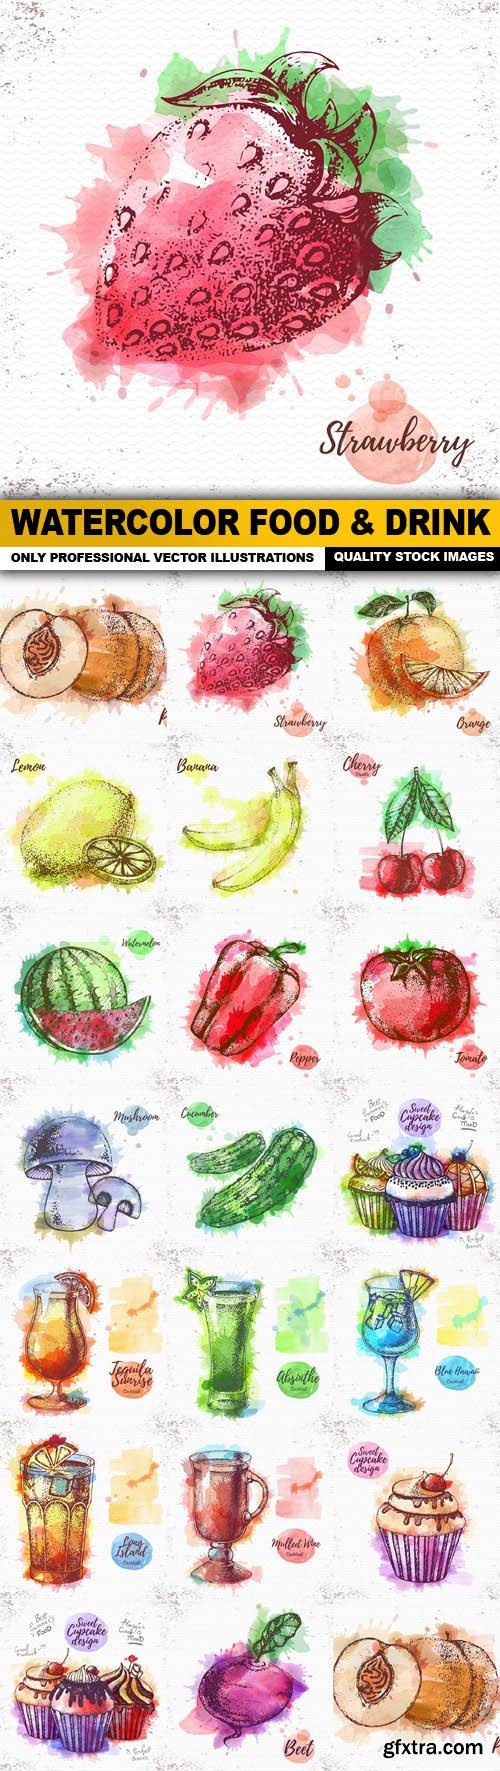 Watercolor Food & Drink - 20 Vector